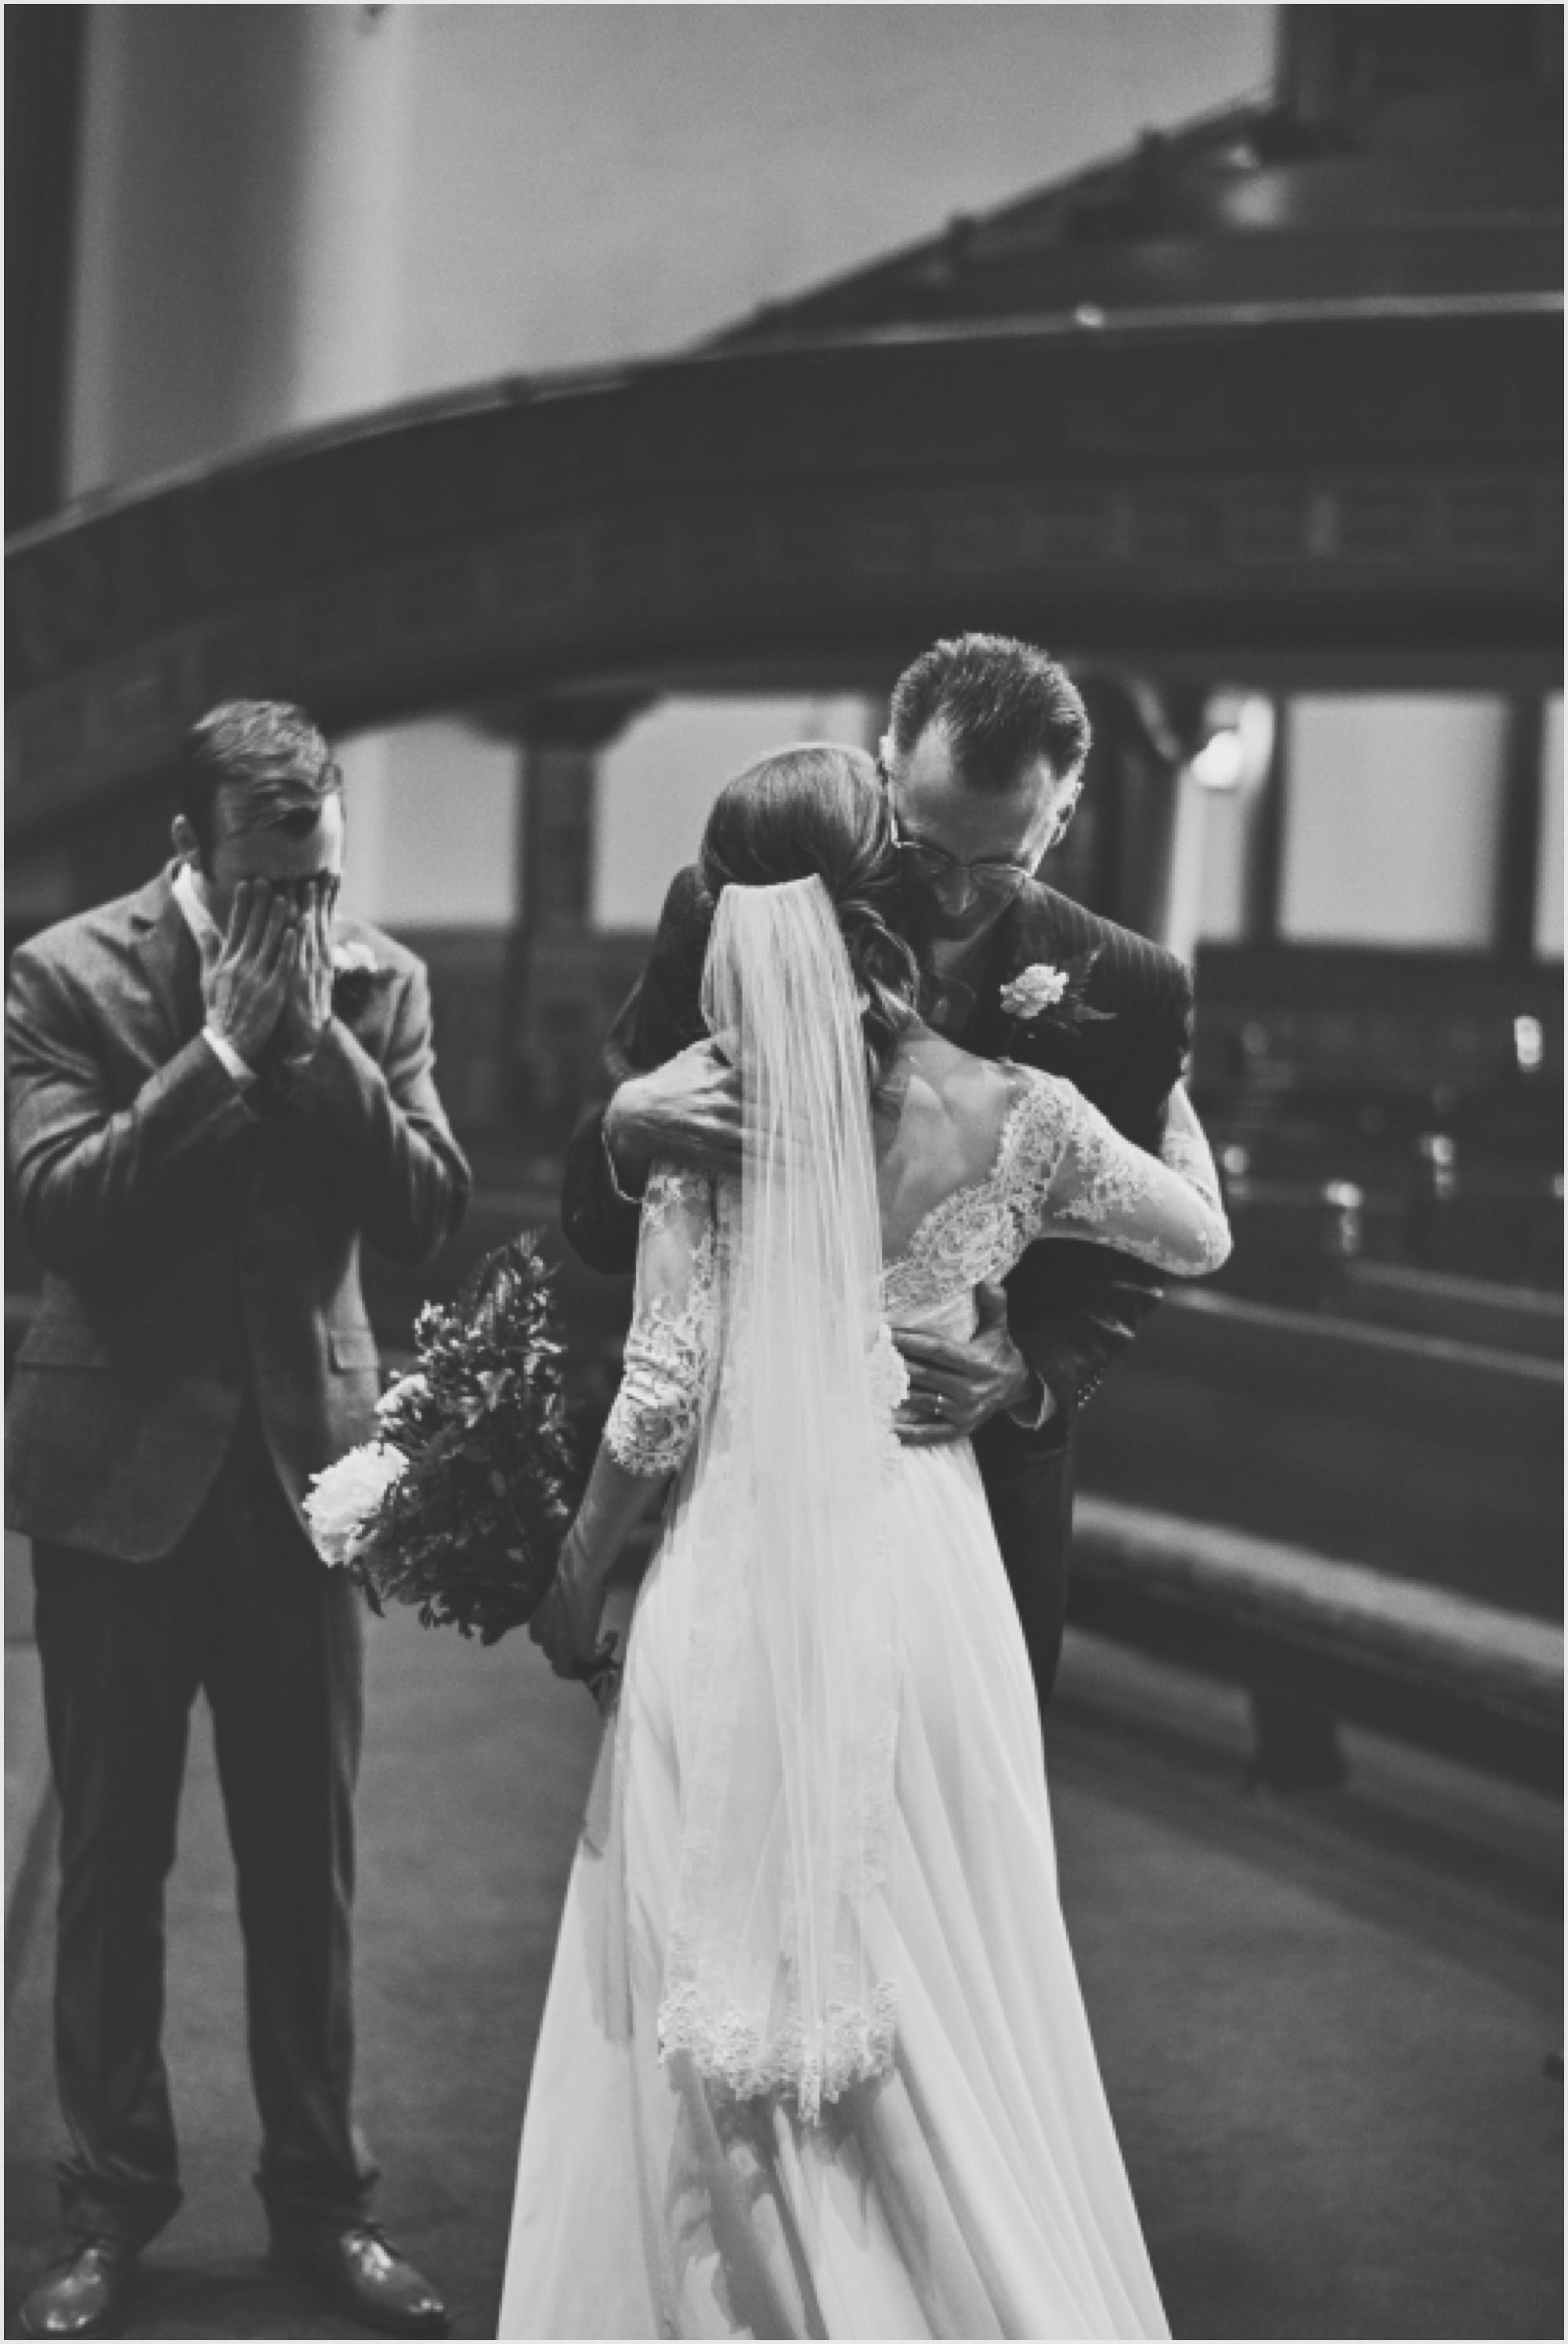 abby_taylor_minneapolis_wedding_lucas_botz_photography_153.jpg